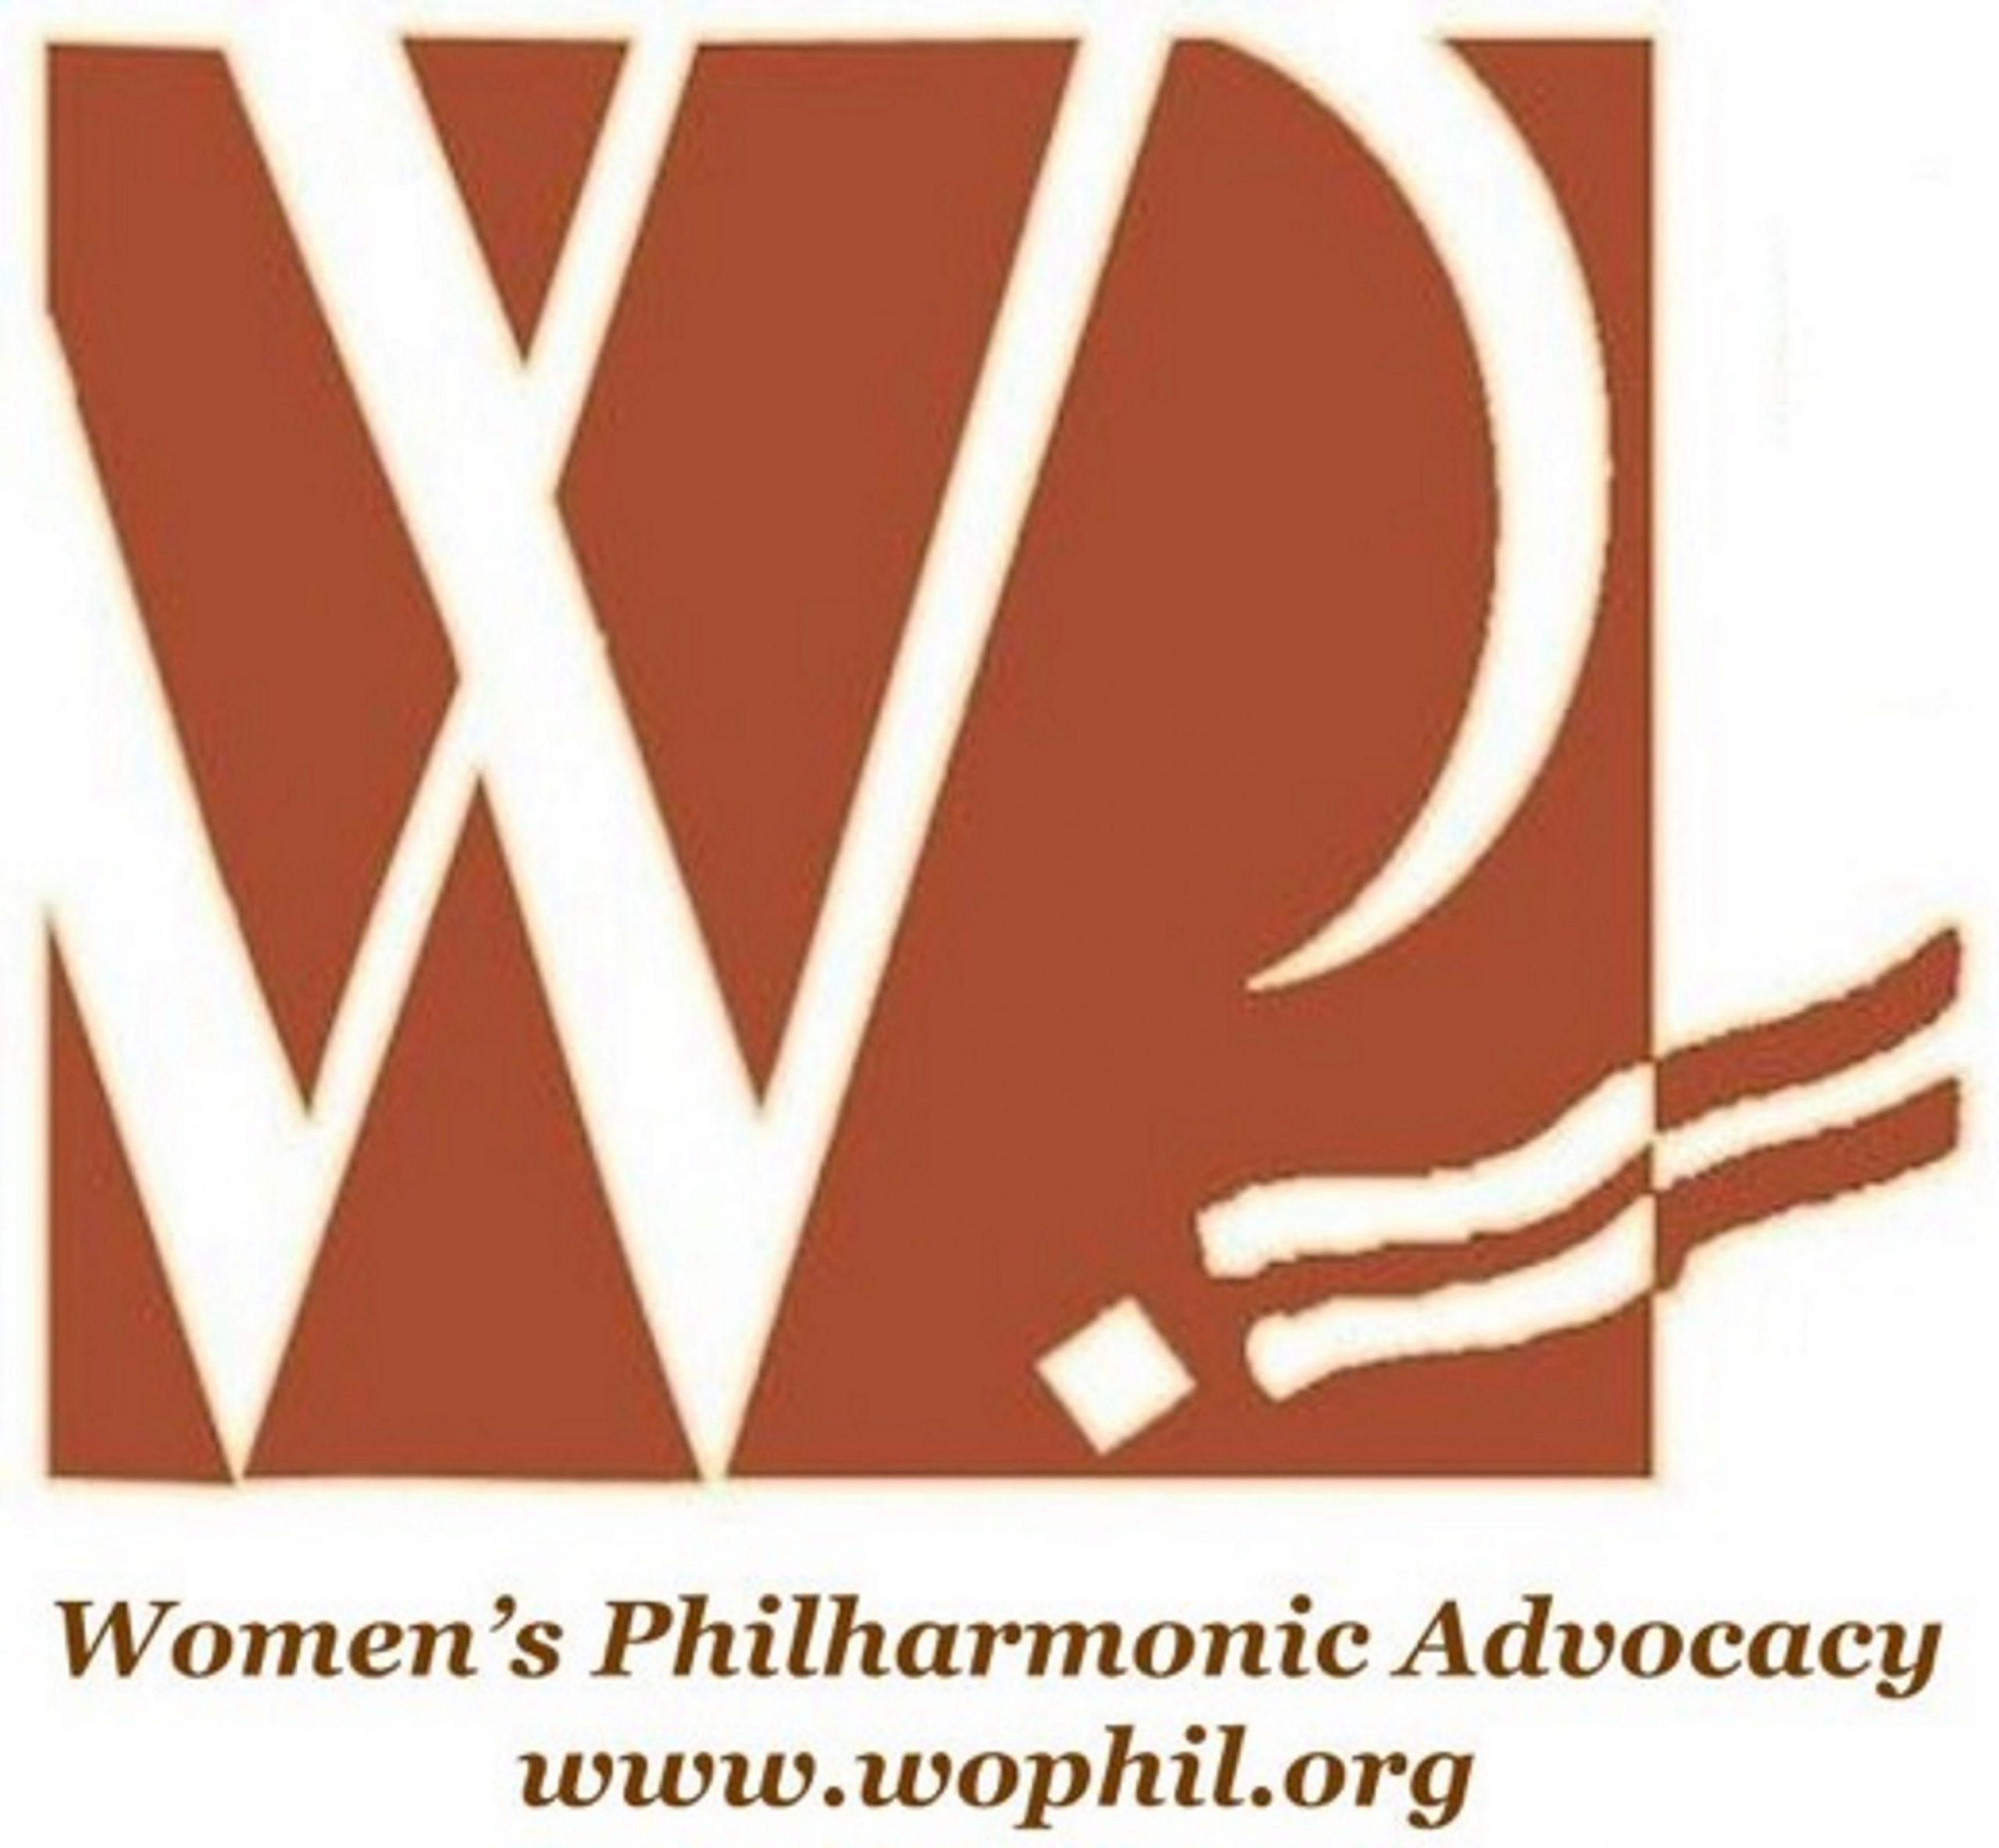 Women's Philharmonic Advocacy Allied Arts of Renton Logo Image